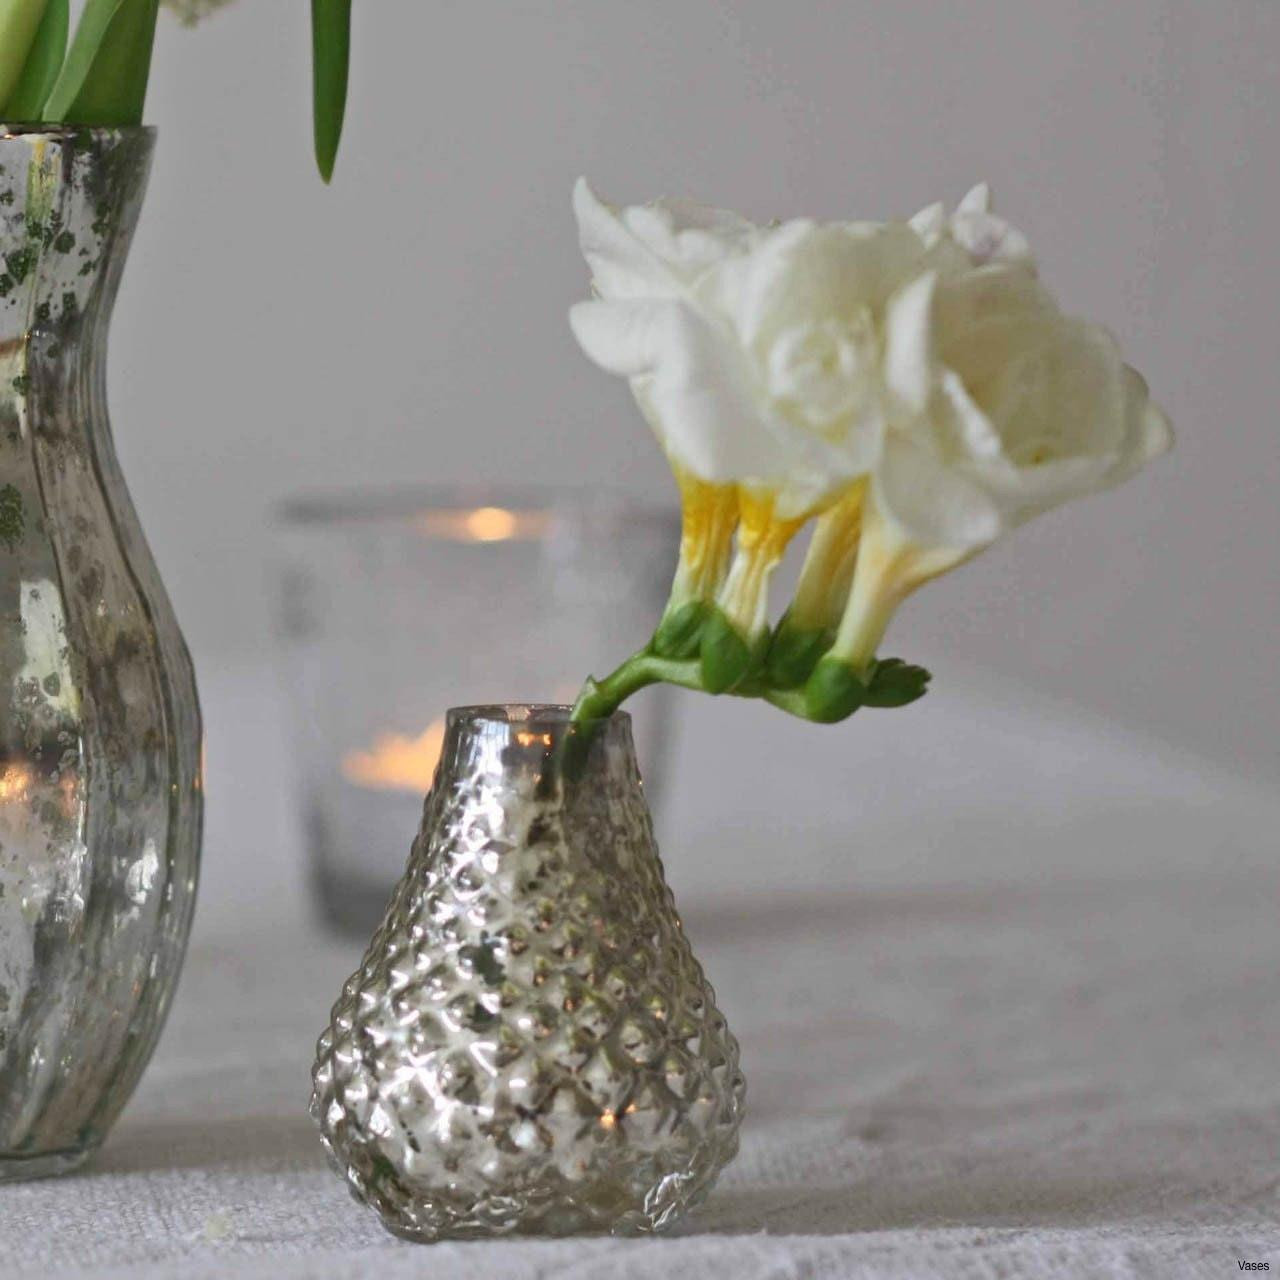 red and yellow glass vase of diy yard decor beautiful jar flower 1h vases bud wedding vase for diy yard decor beautiful jar flower 1h vases bud wedding vase centerpiece idea i 0d design